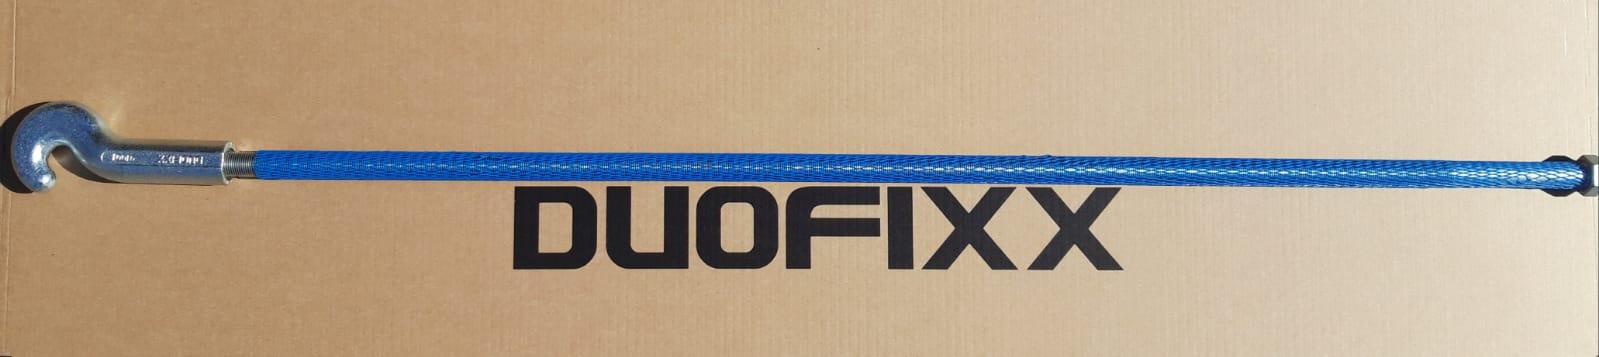 DUOFIXX ĀĶIS (HOOK) 1000MM